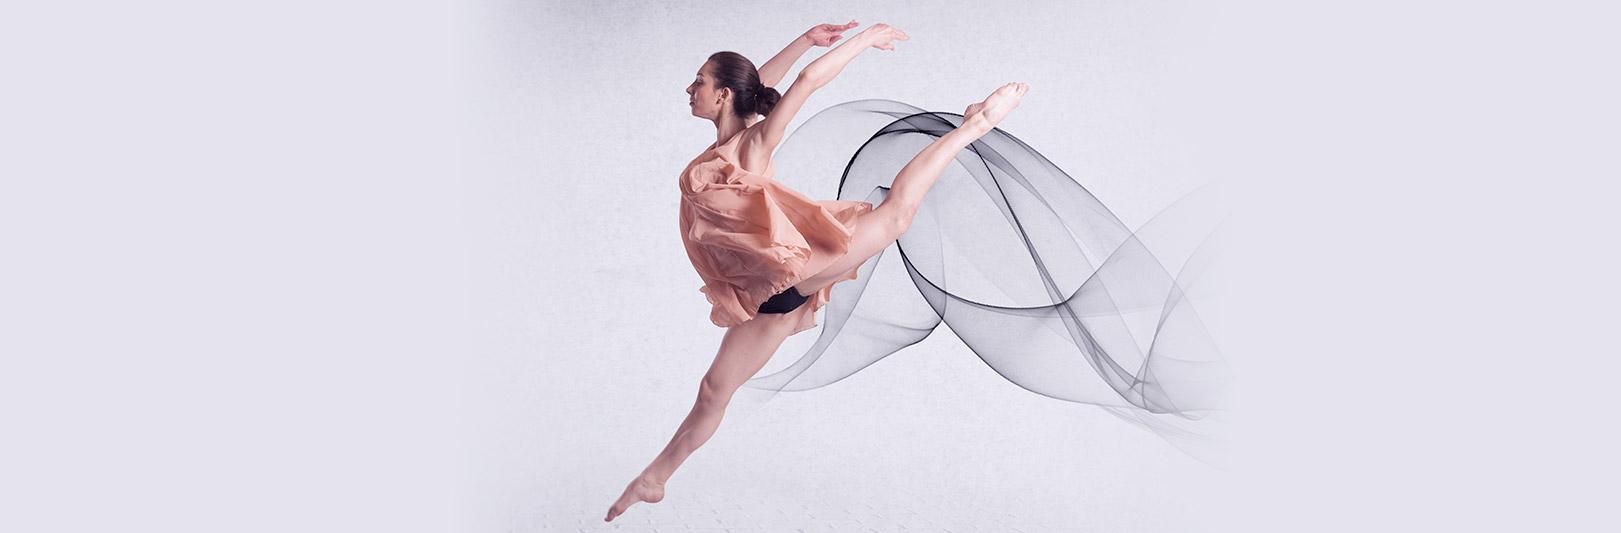 gyrokinesis tanzschule kurse muenchen 01 - Gyrokinesis EN